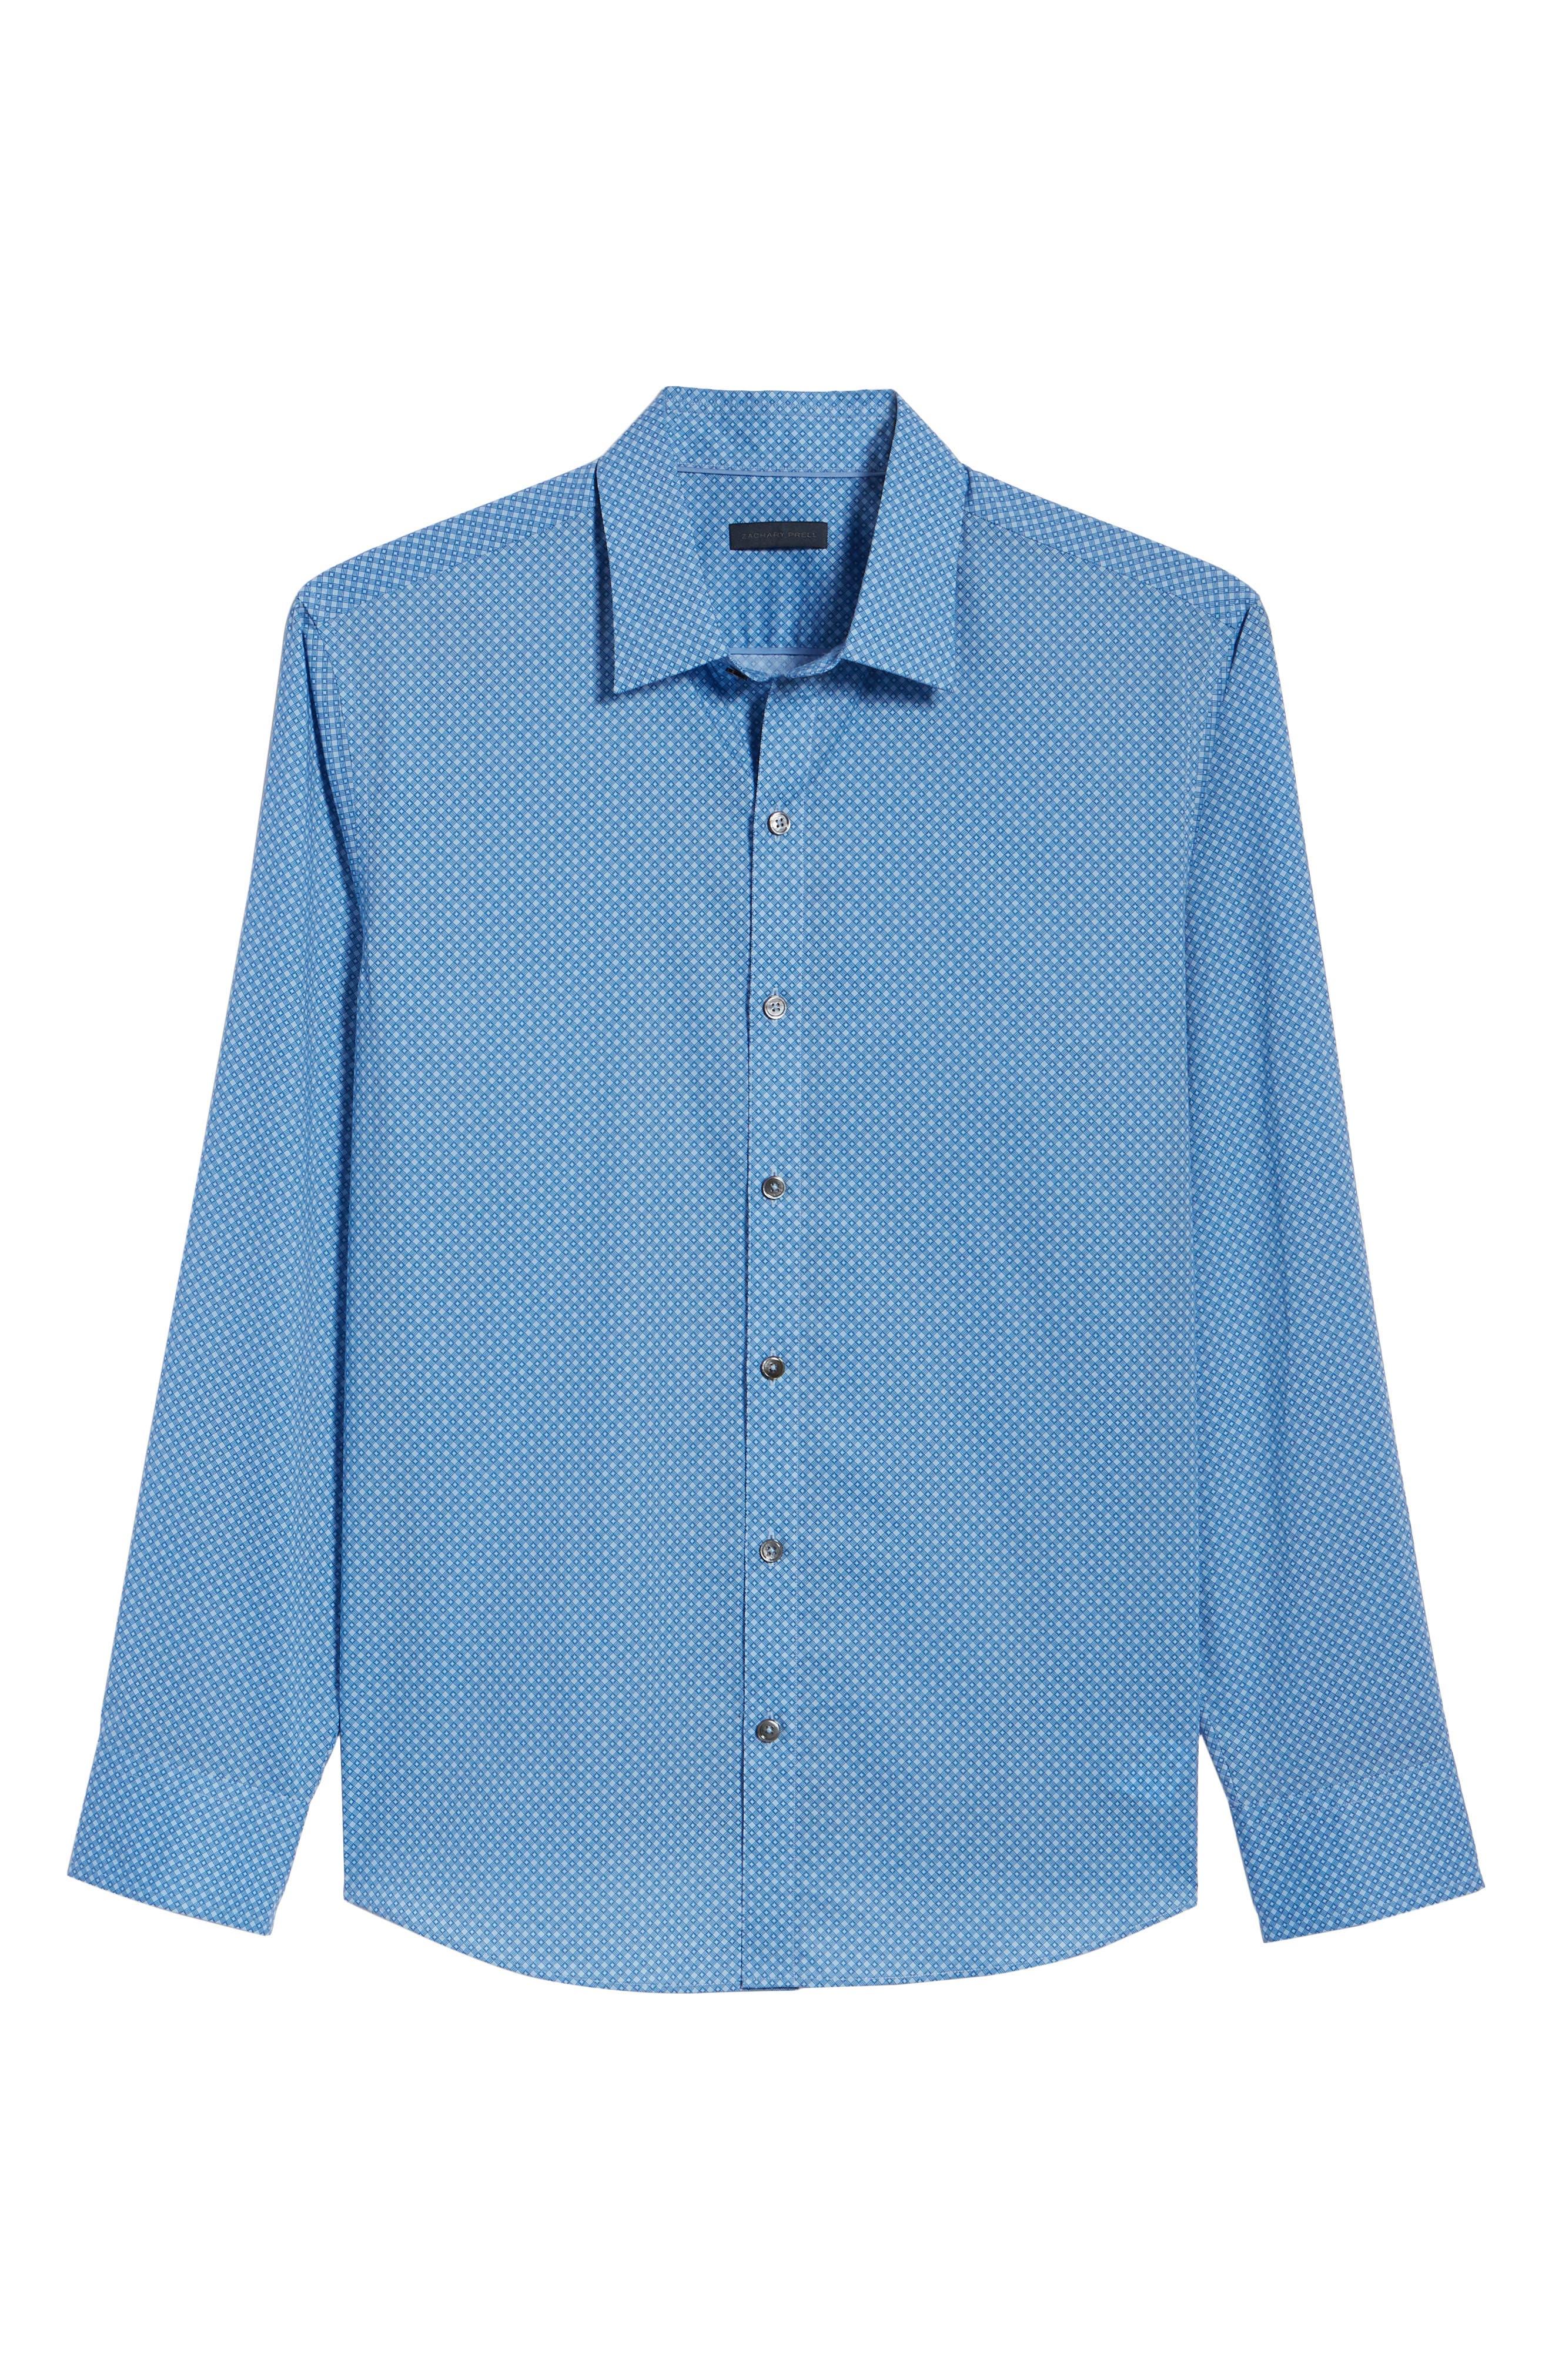 Ethan Slim Fit Sport Shirt,                             Alternate thumbnail 6, color,                             Blue